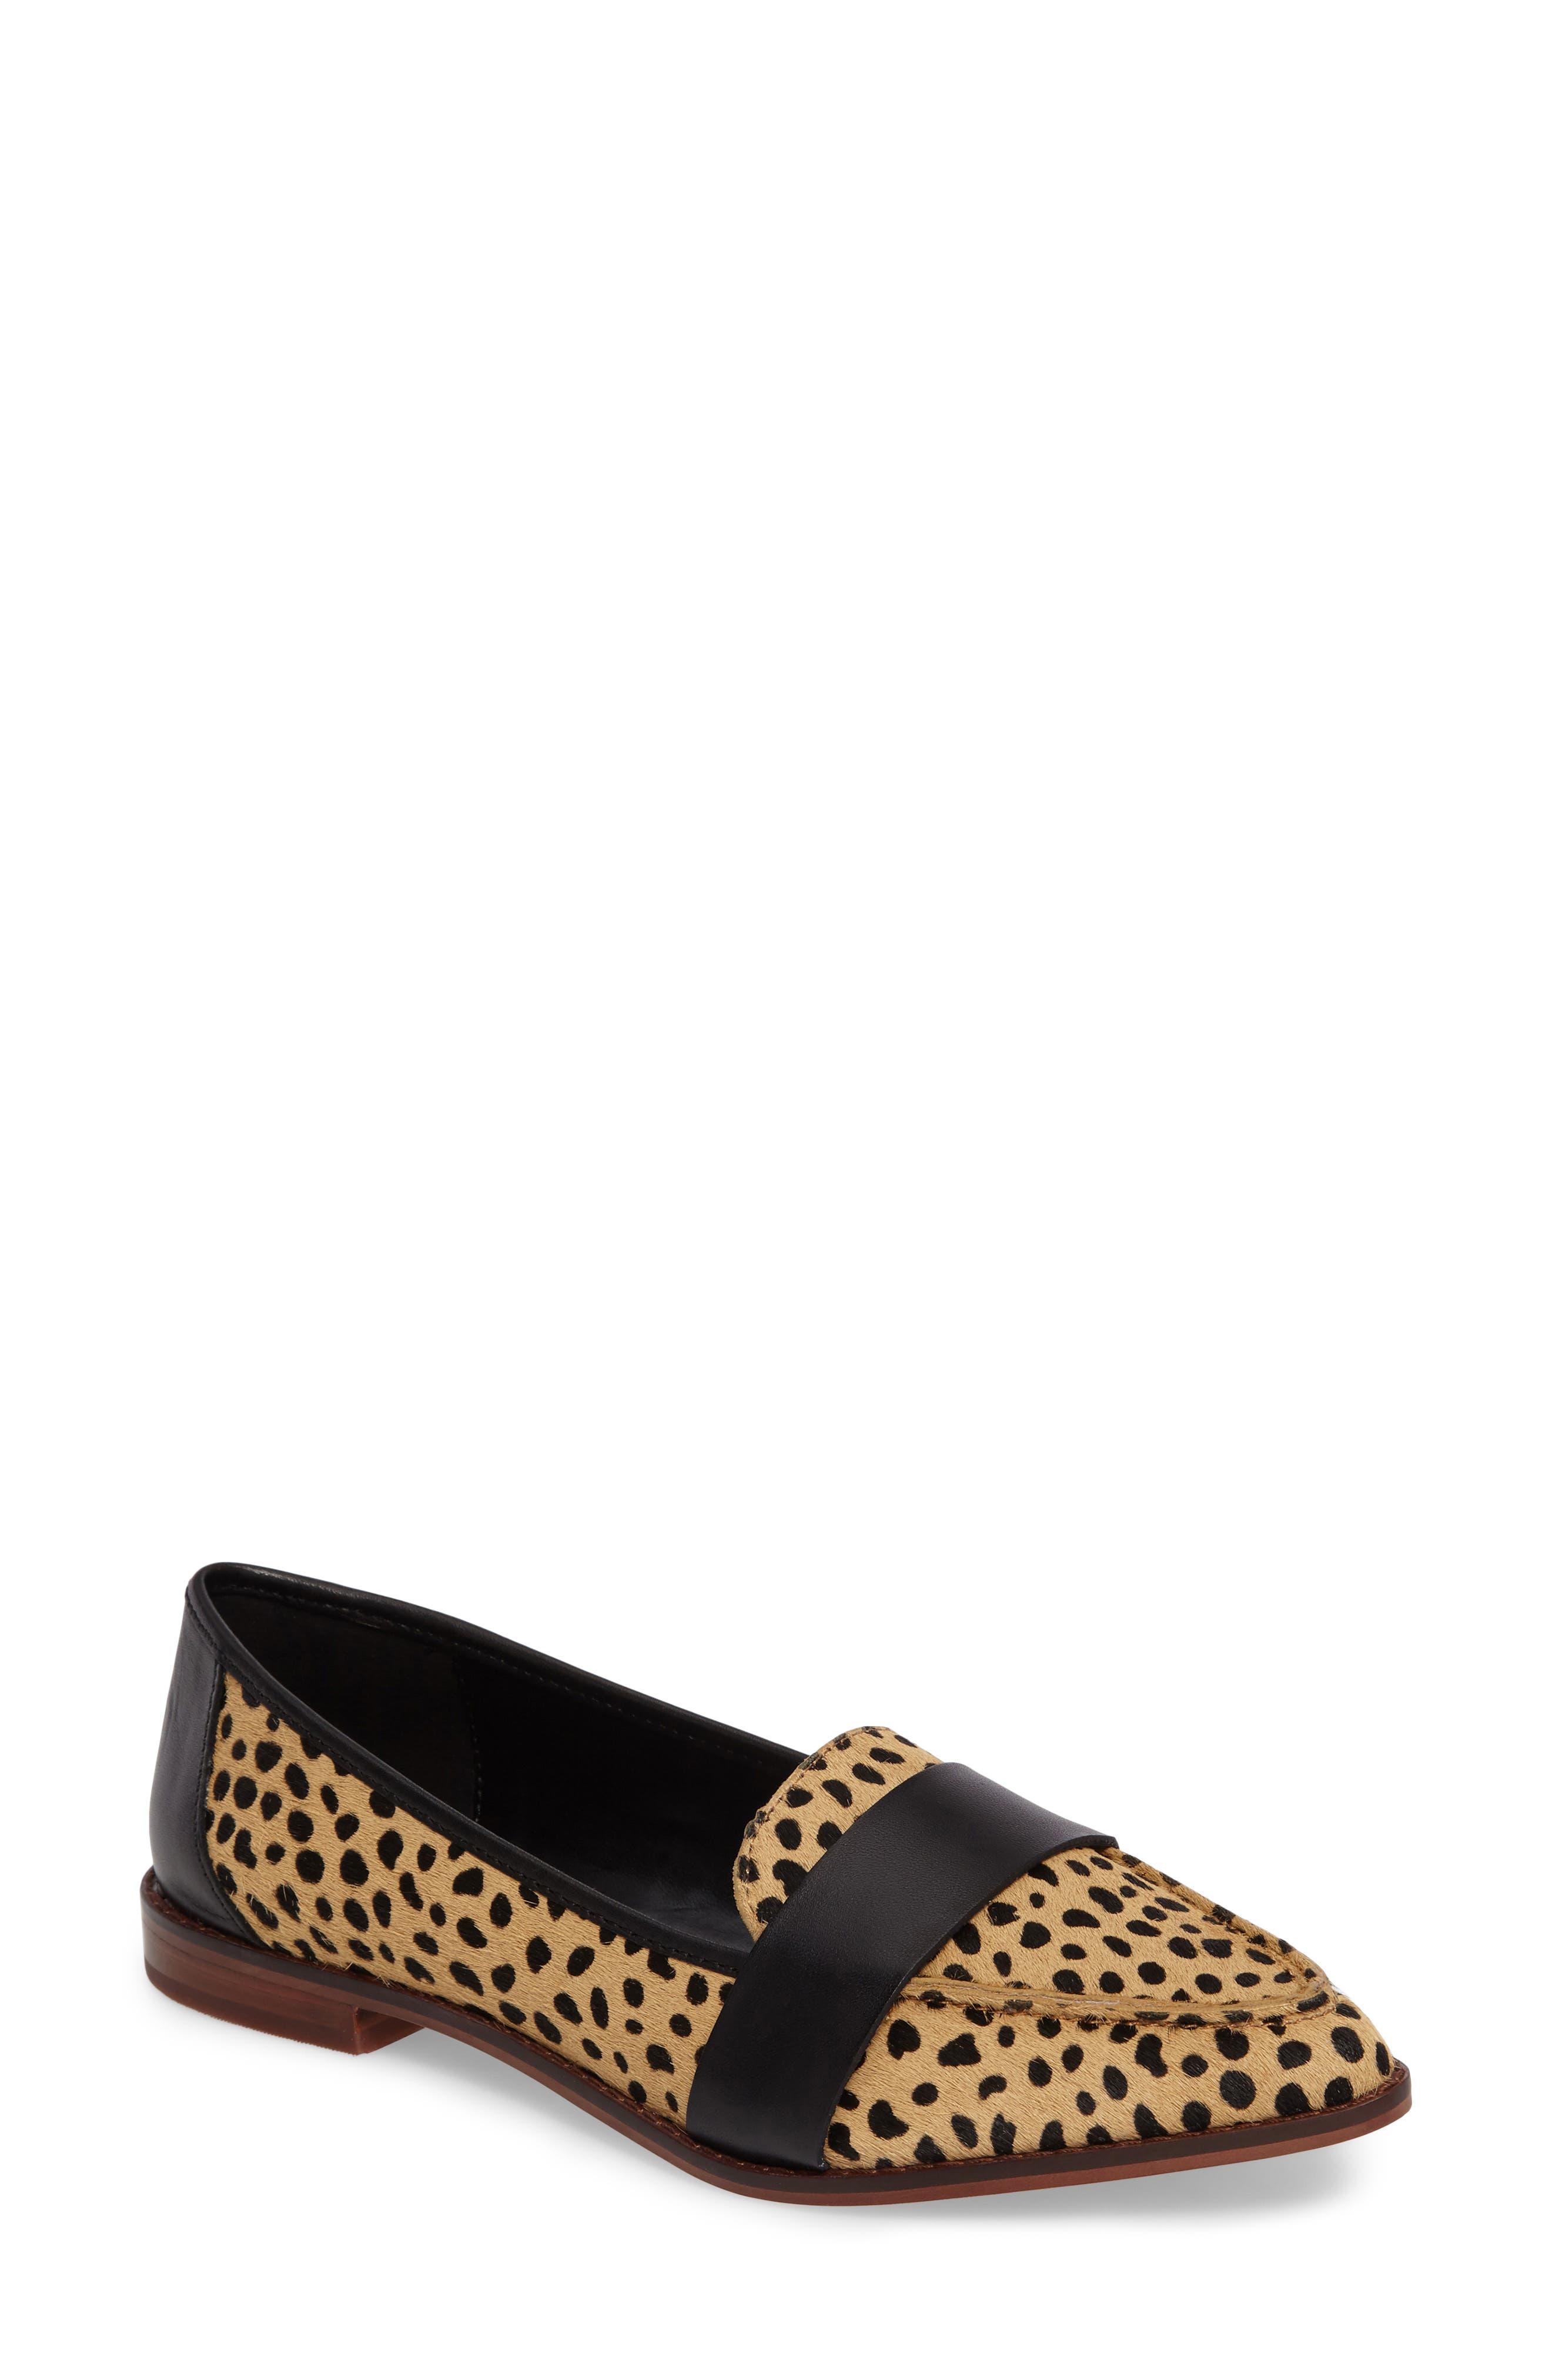 Edie Pointy Toe Loafer,                             Main thumbnail 1, color,                             Cheetah Calfhair